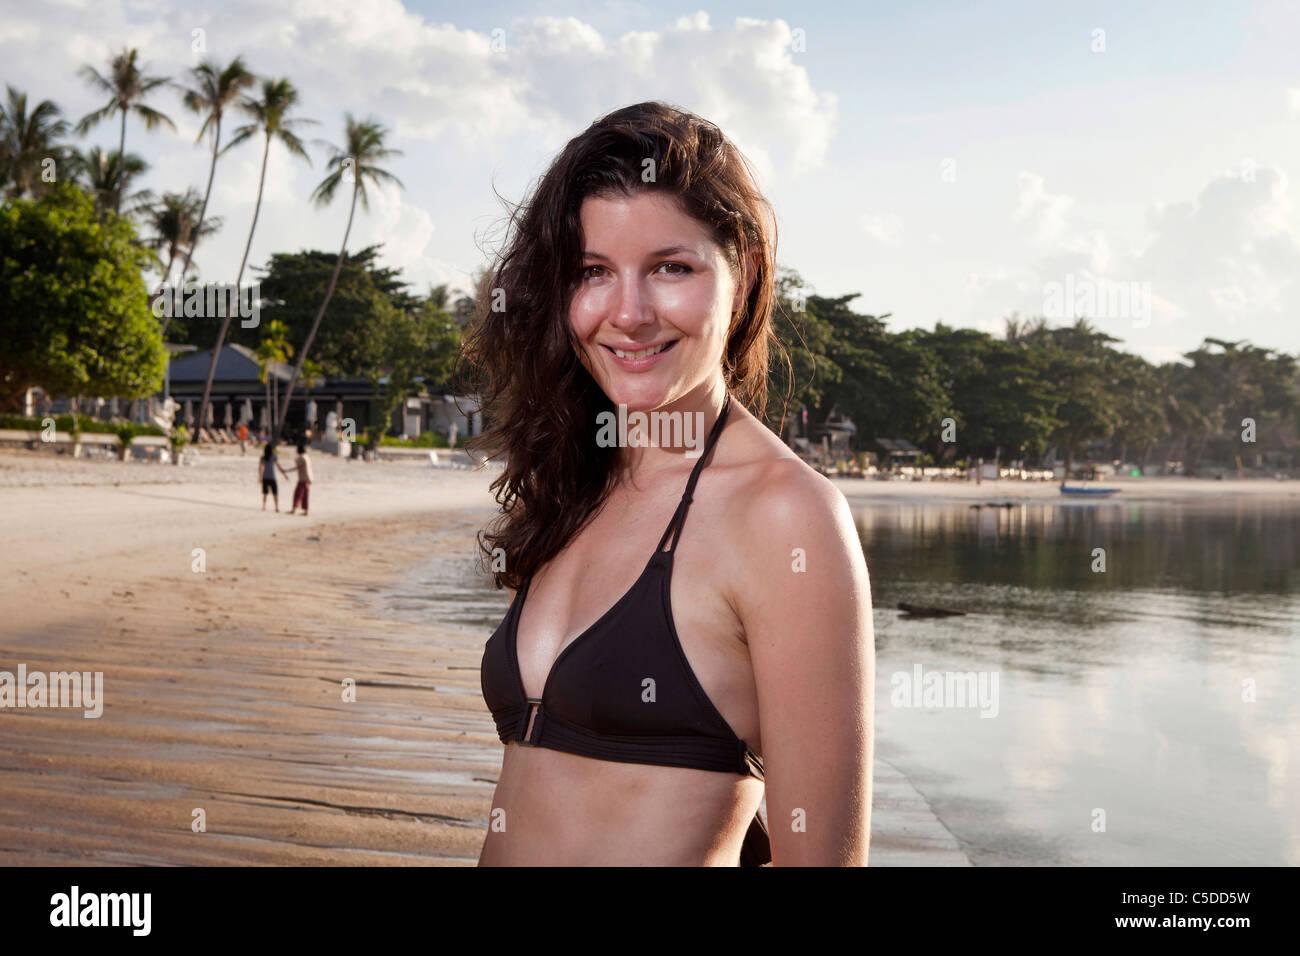 Model posing on a tropical beach Stock Photo